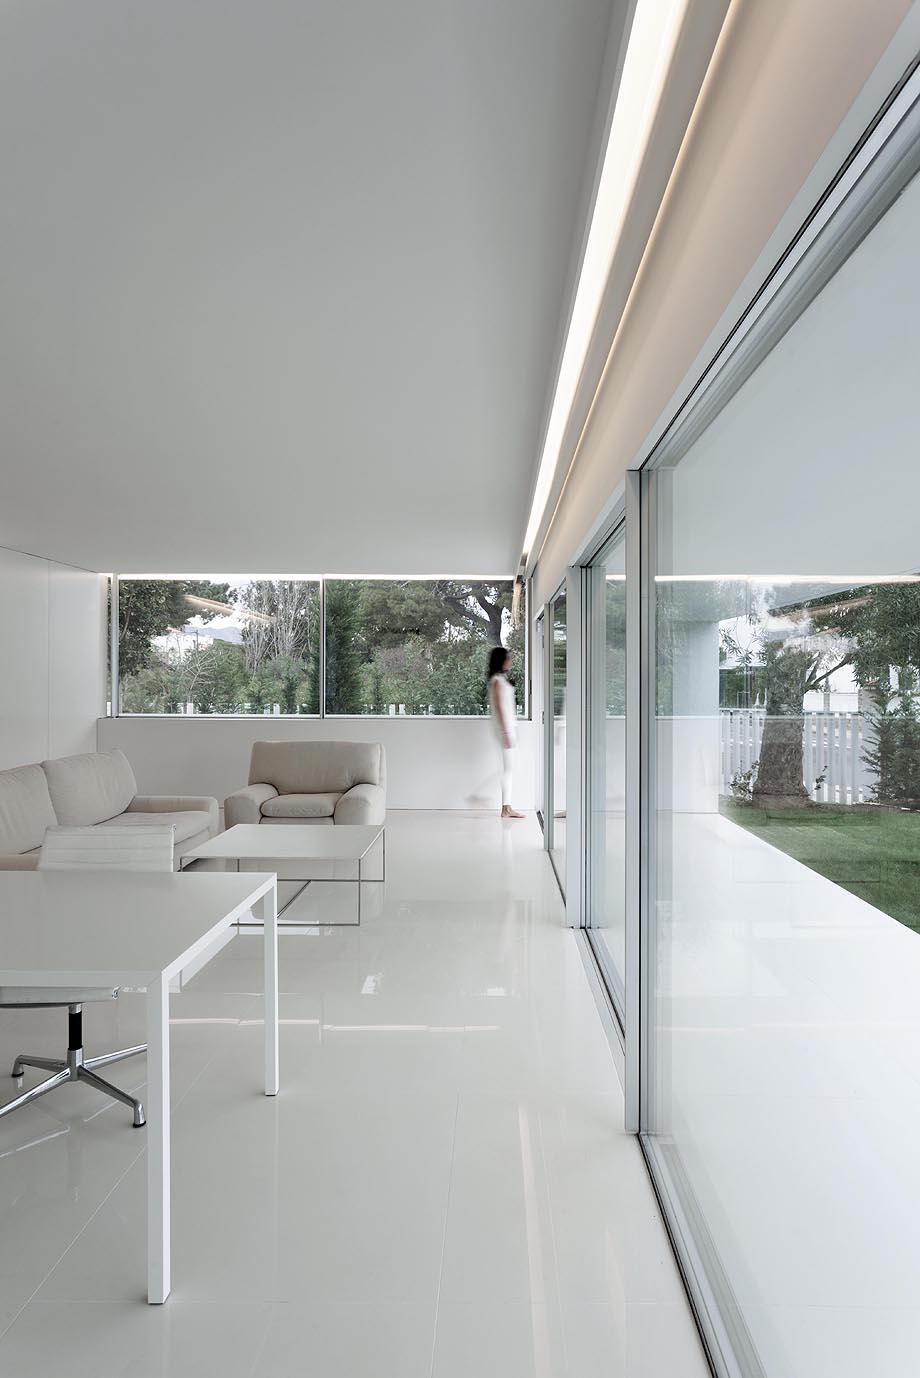 breeze house de fran silvestre arquitectos (3)